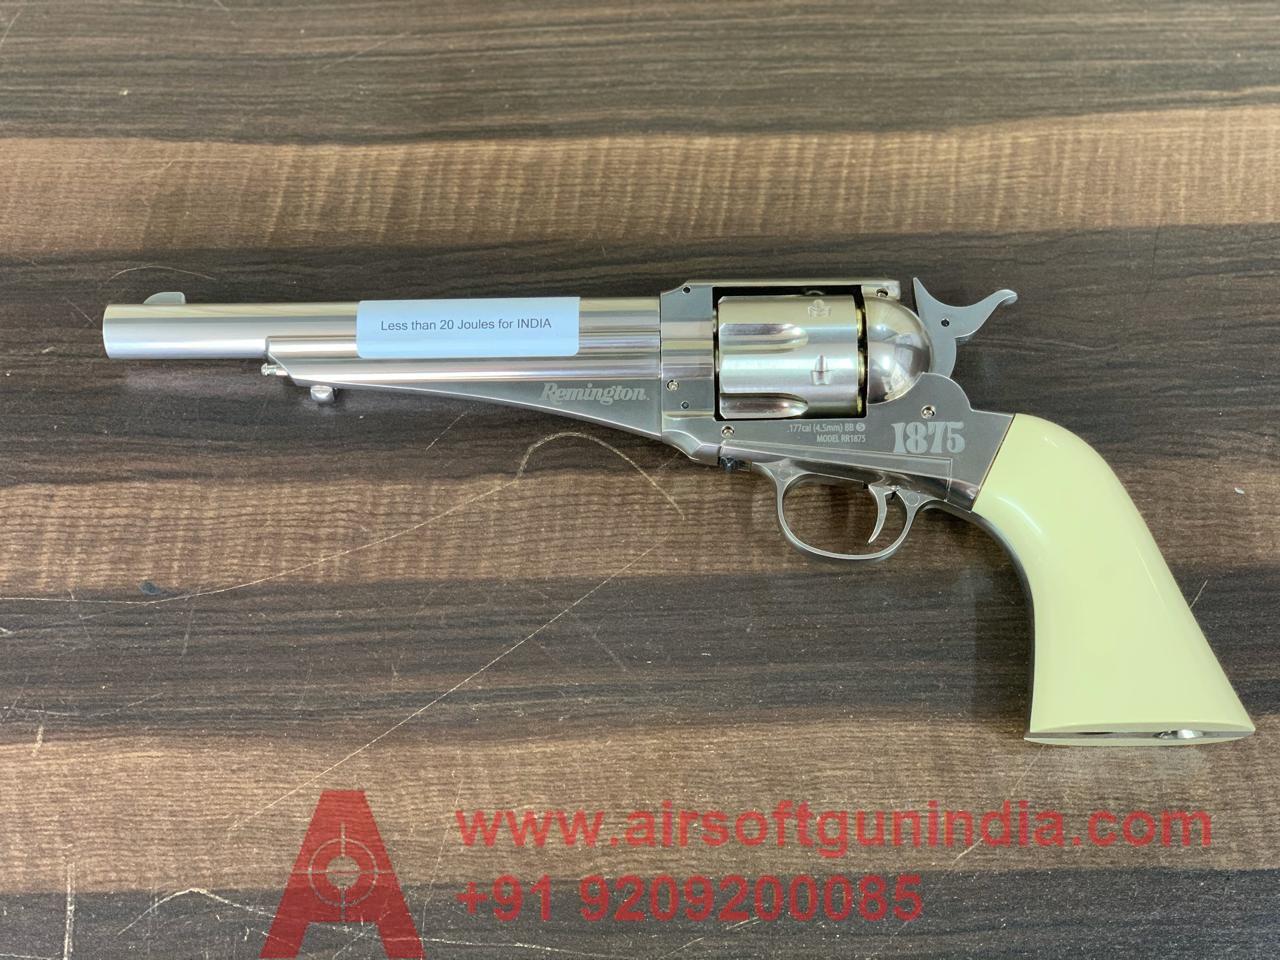 Remington 1875 CO2 Dual Ammo Co2 Revolver By Airsoft Gun India